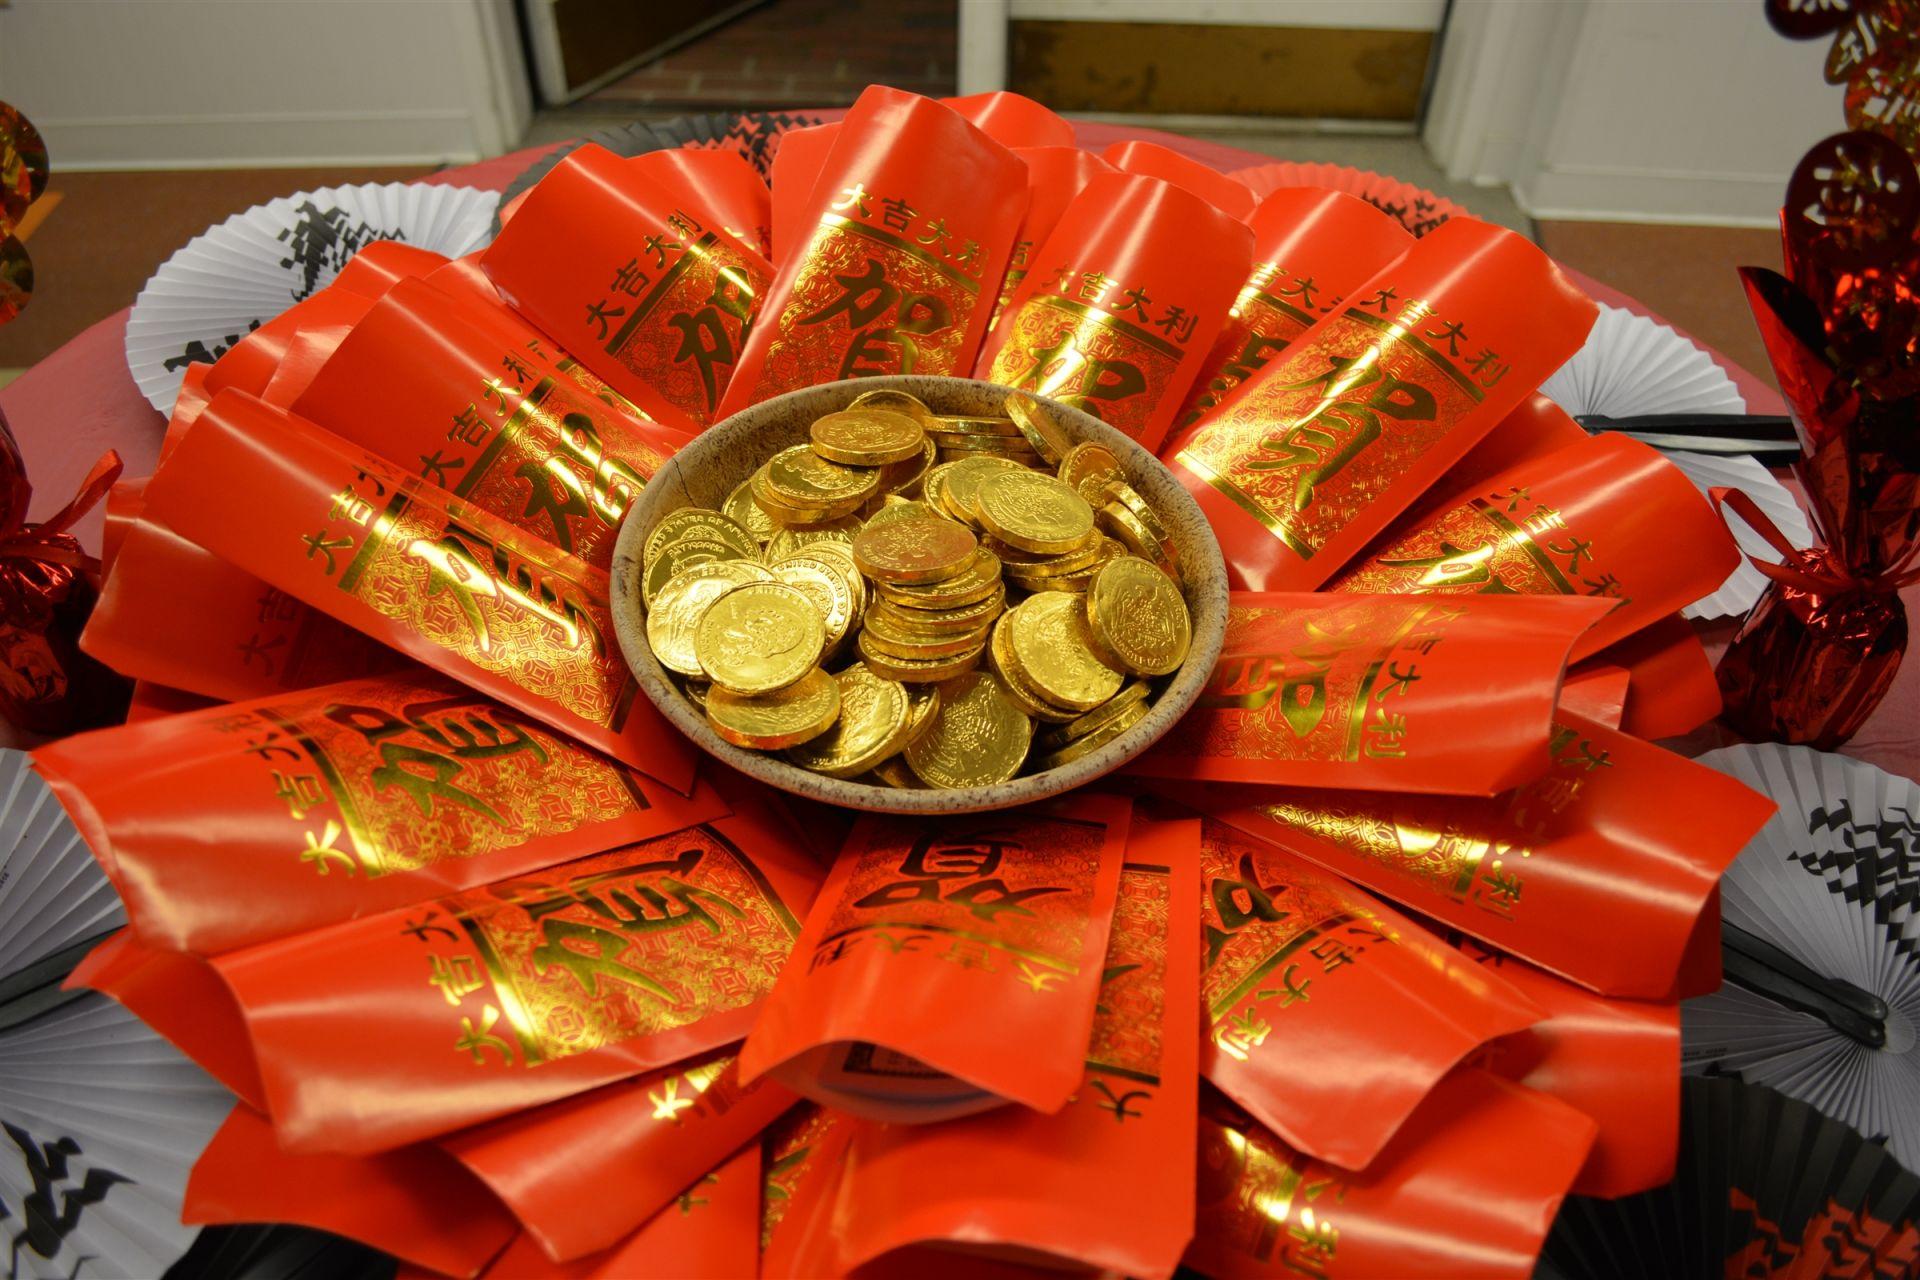 Christchurch School Photo Gallery Andrew Smith Bermuda Shorts Cokelat 33 Lunar New Year 2017 Photos By Eric